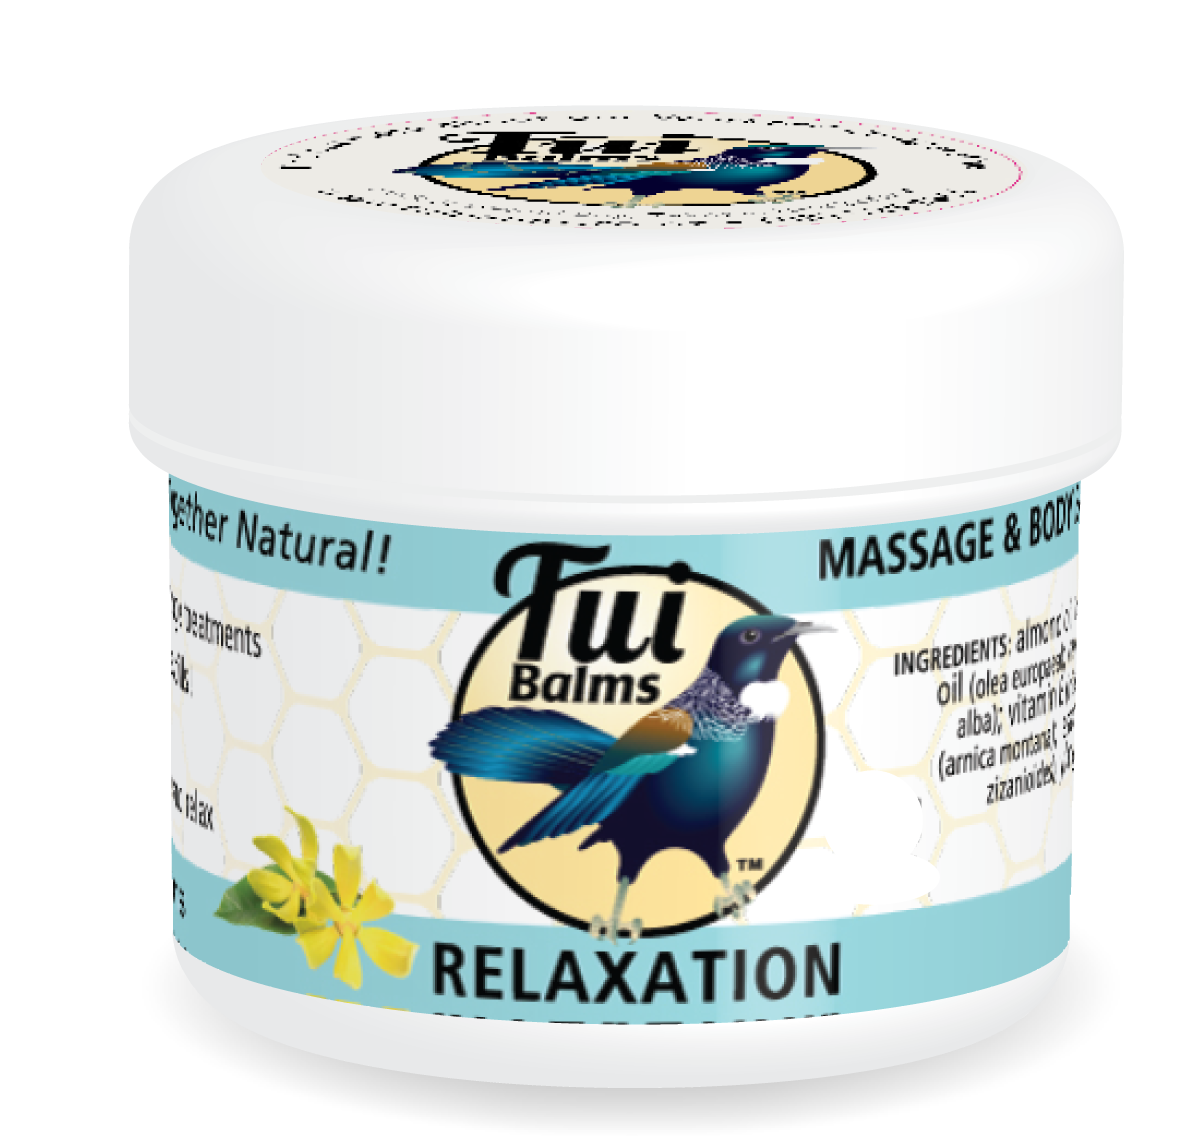 Massage & Body Balm RELAXATION